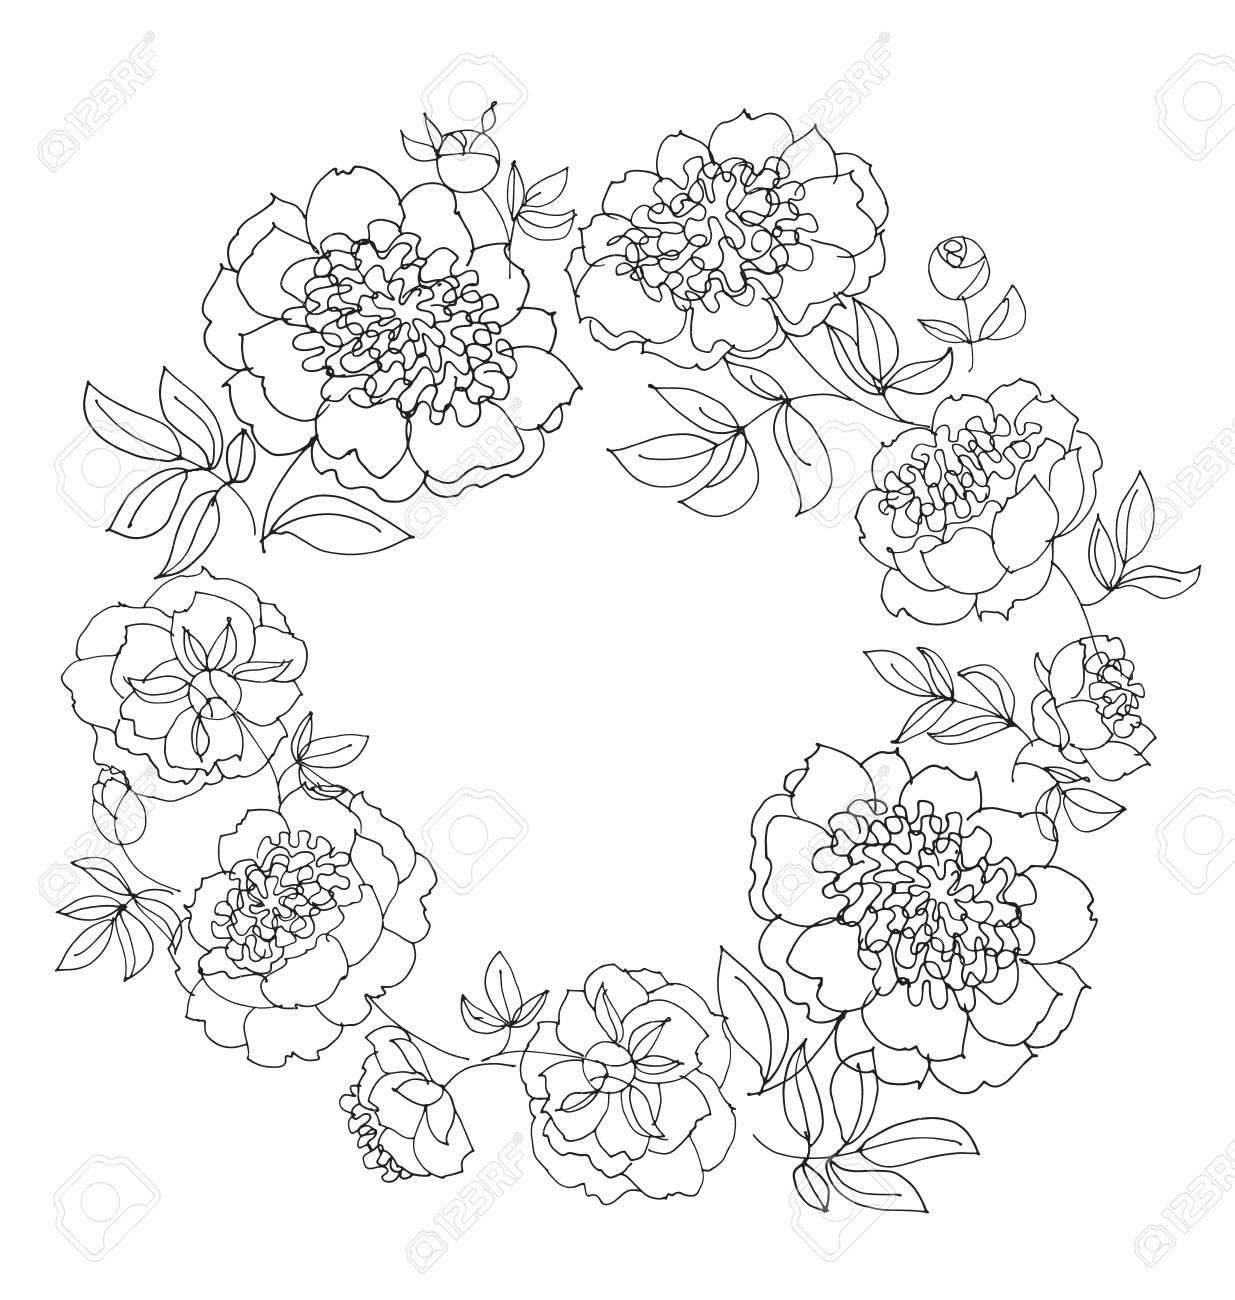 1235x1300 Peony Flower Wreath Vector Illustration. Line Sketch Hand Drawn